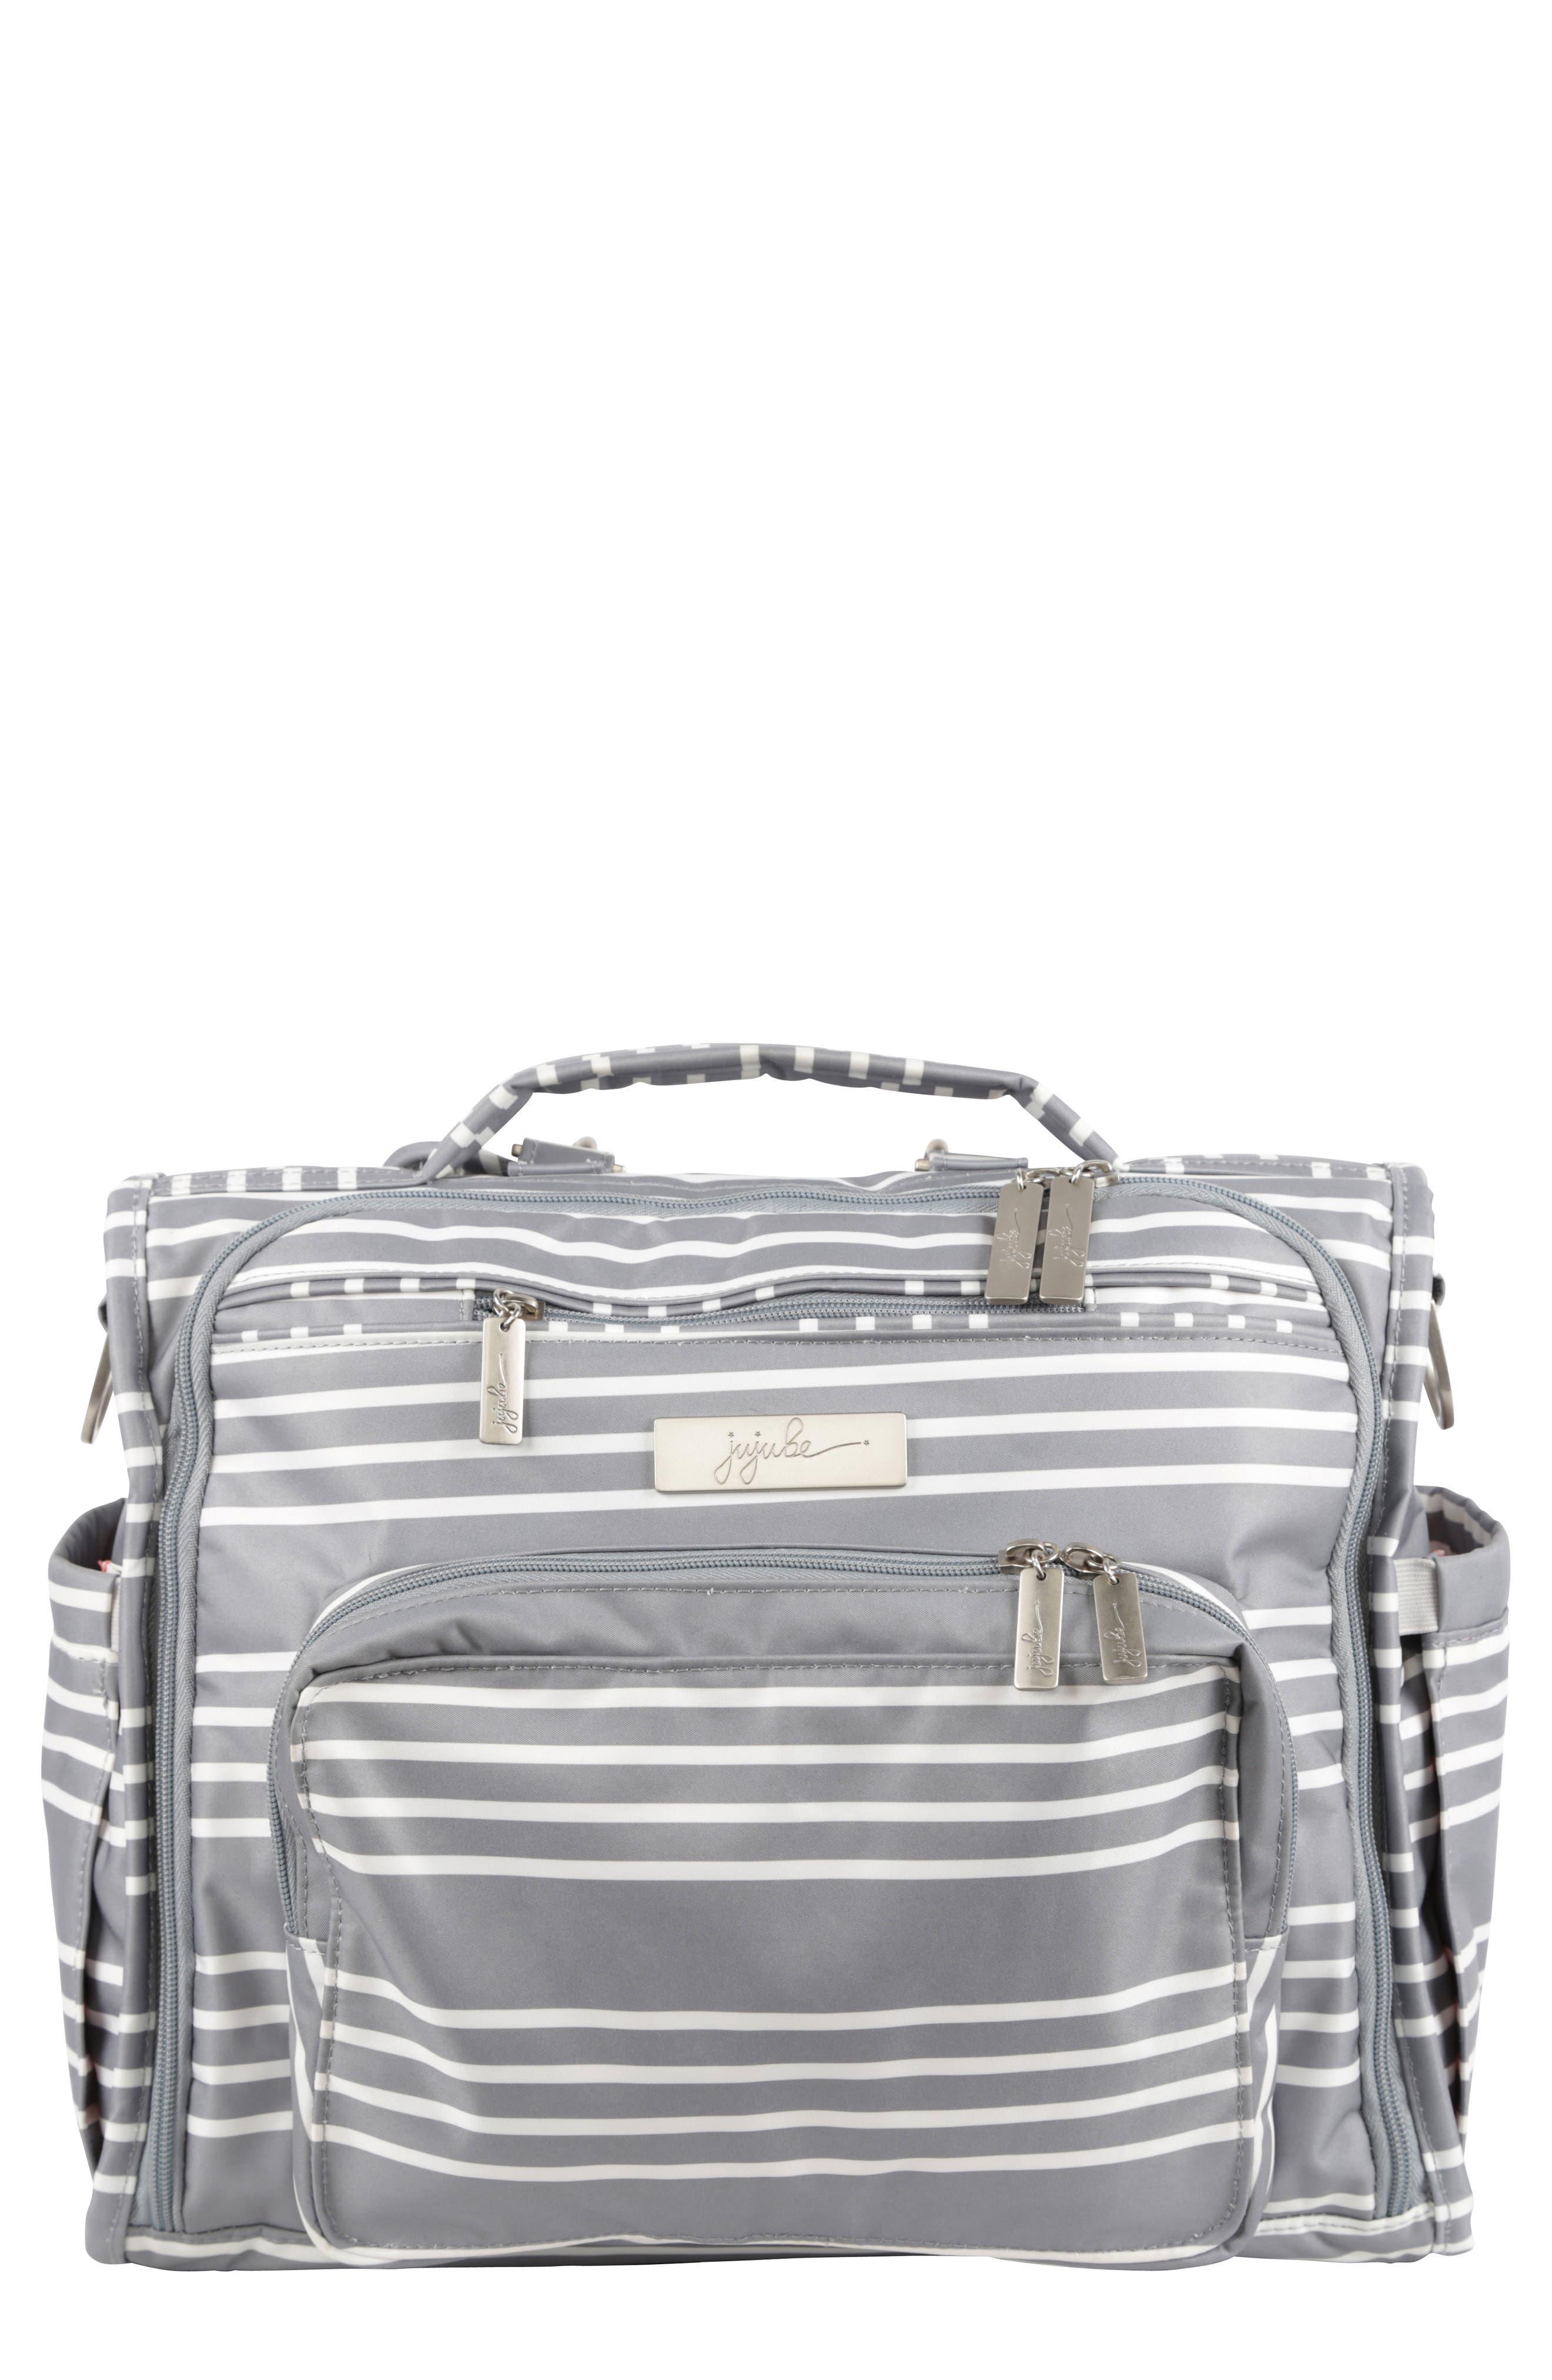 BFF - Coastal Collection Diaper Bag,                             Main thumbnail 1, color,                             042